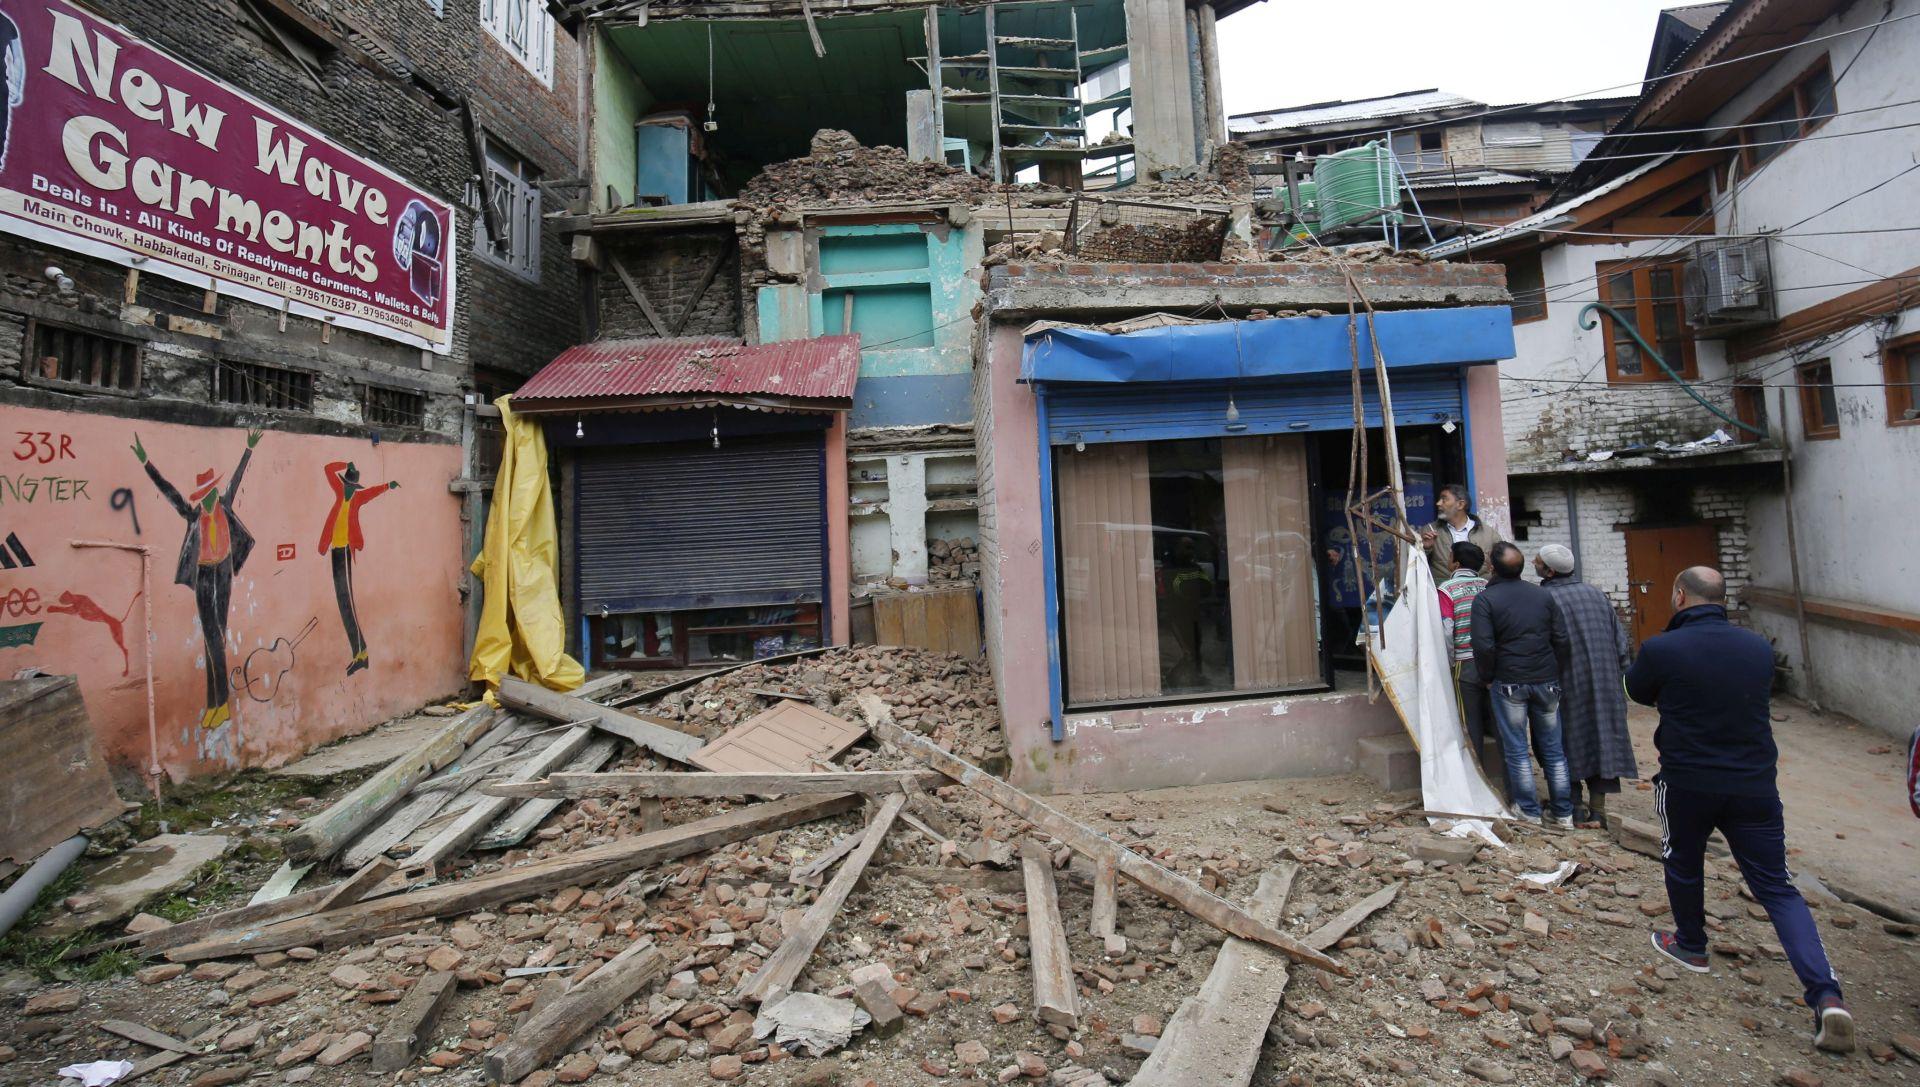 EPICENTAR U PLANINAMA KUSH Potres magnitude 6.6 osjetio se u Afganistanu, Pakistanu i Indiji